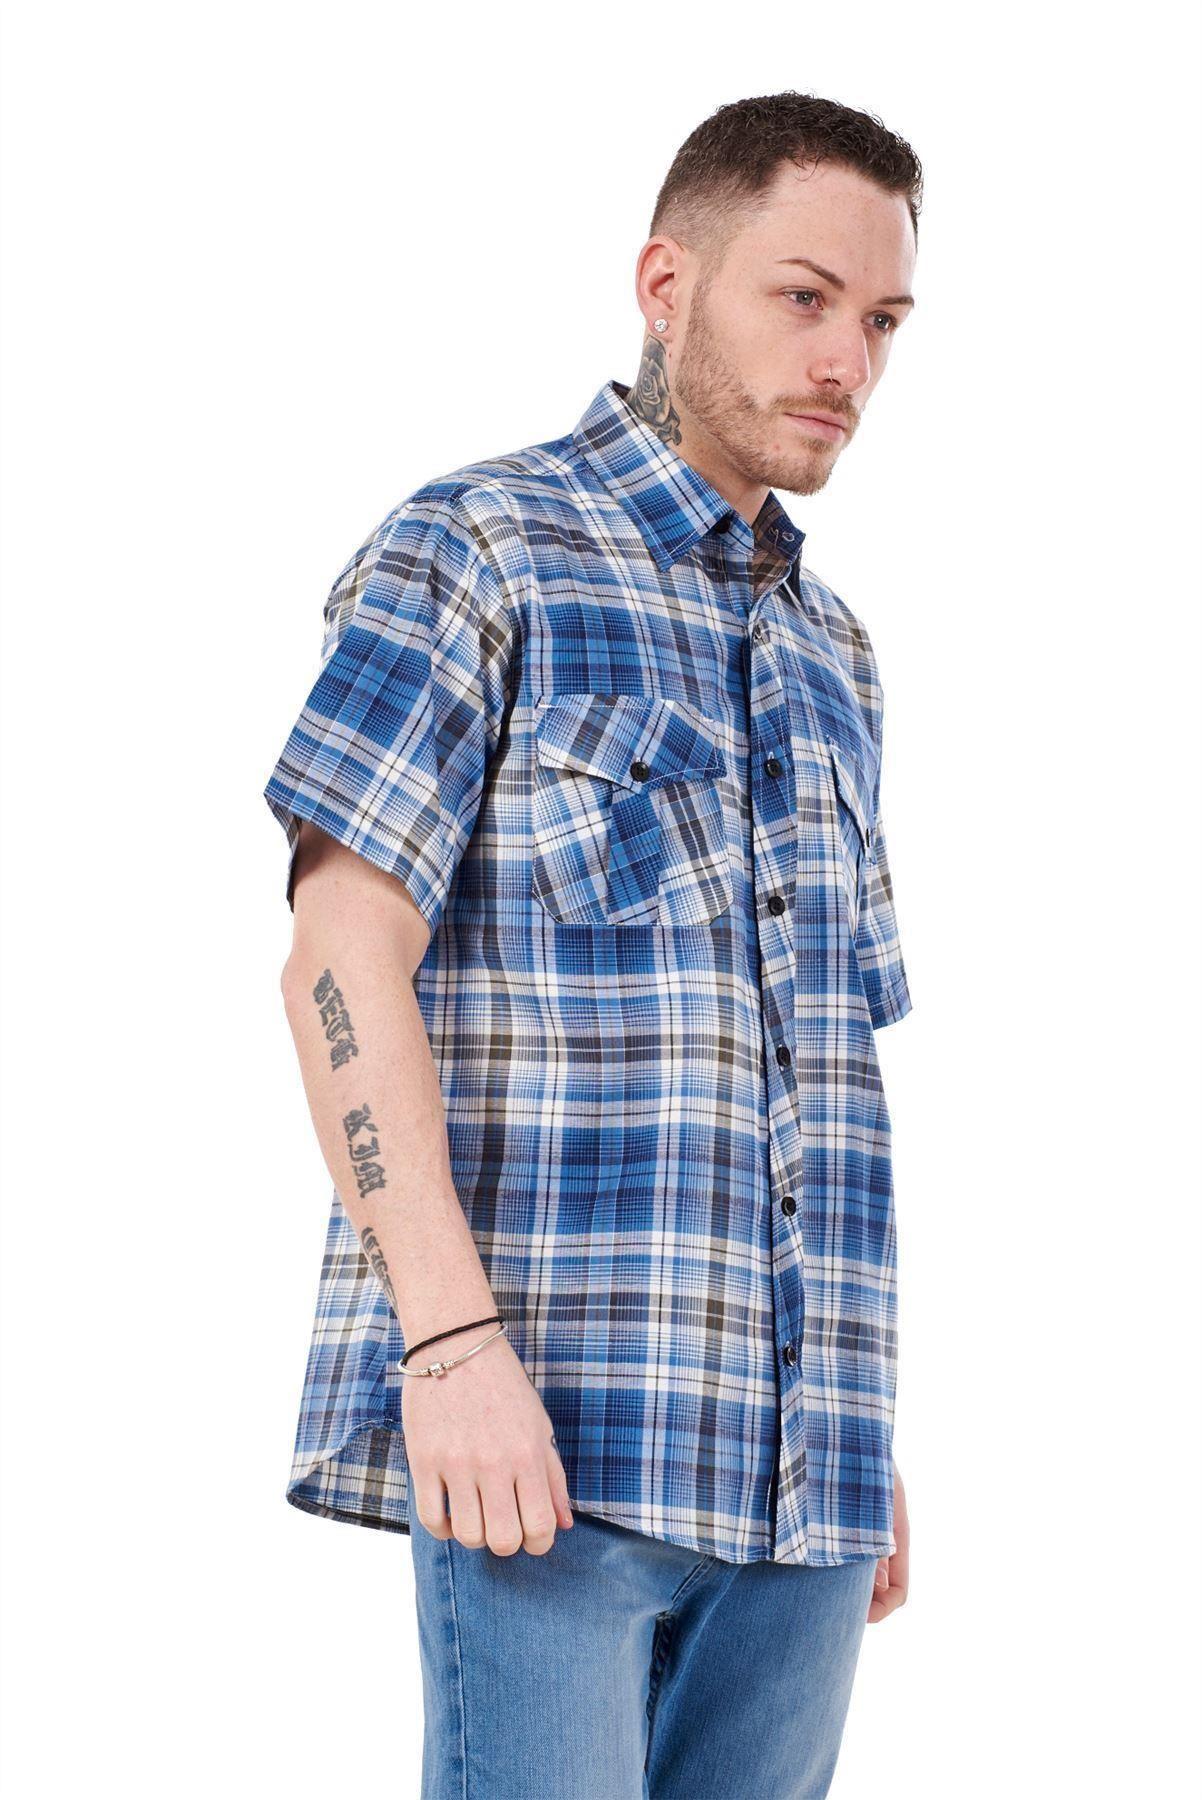 Mens-Regular-Big-Size-Shirts-Checked-Cotton-Blend-Casual-Short-Sleeve-Blue-M-5XL thumbnail 8